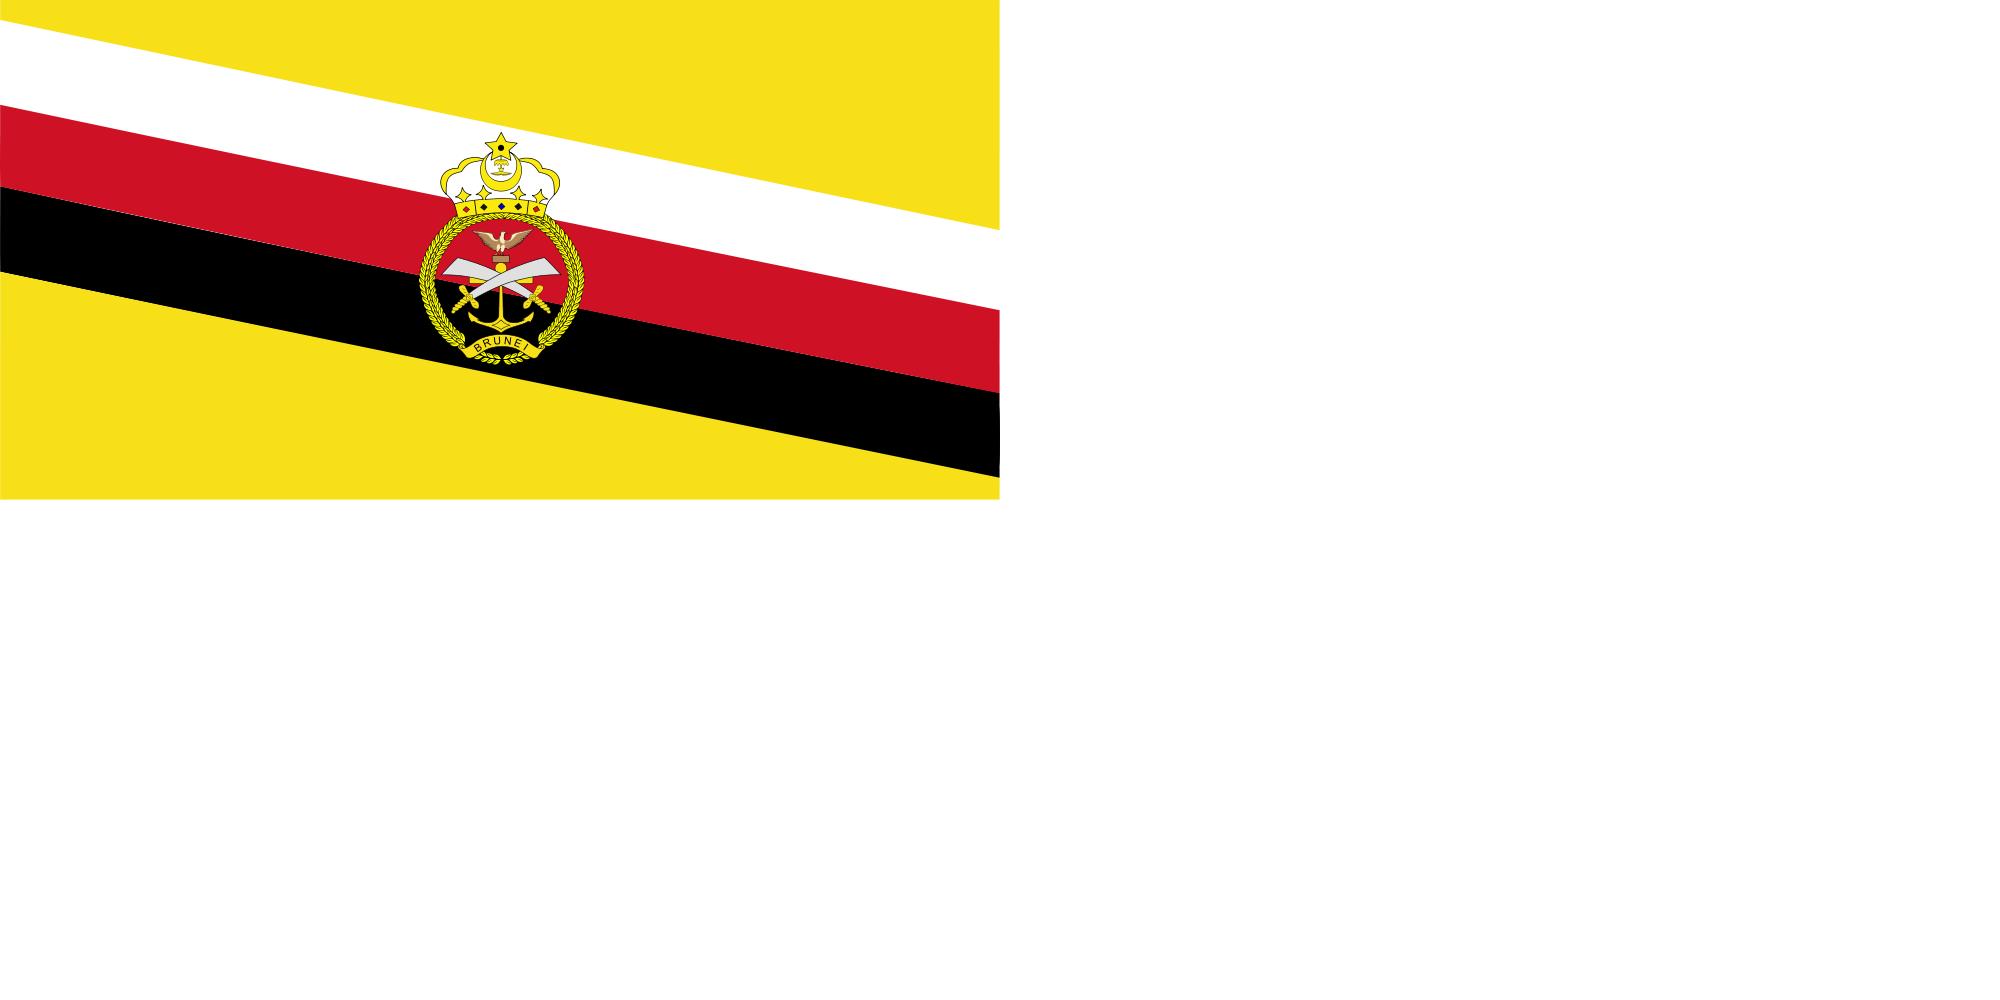 Brunei (Naval ensign)